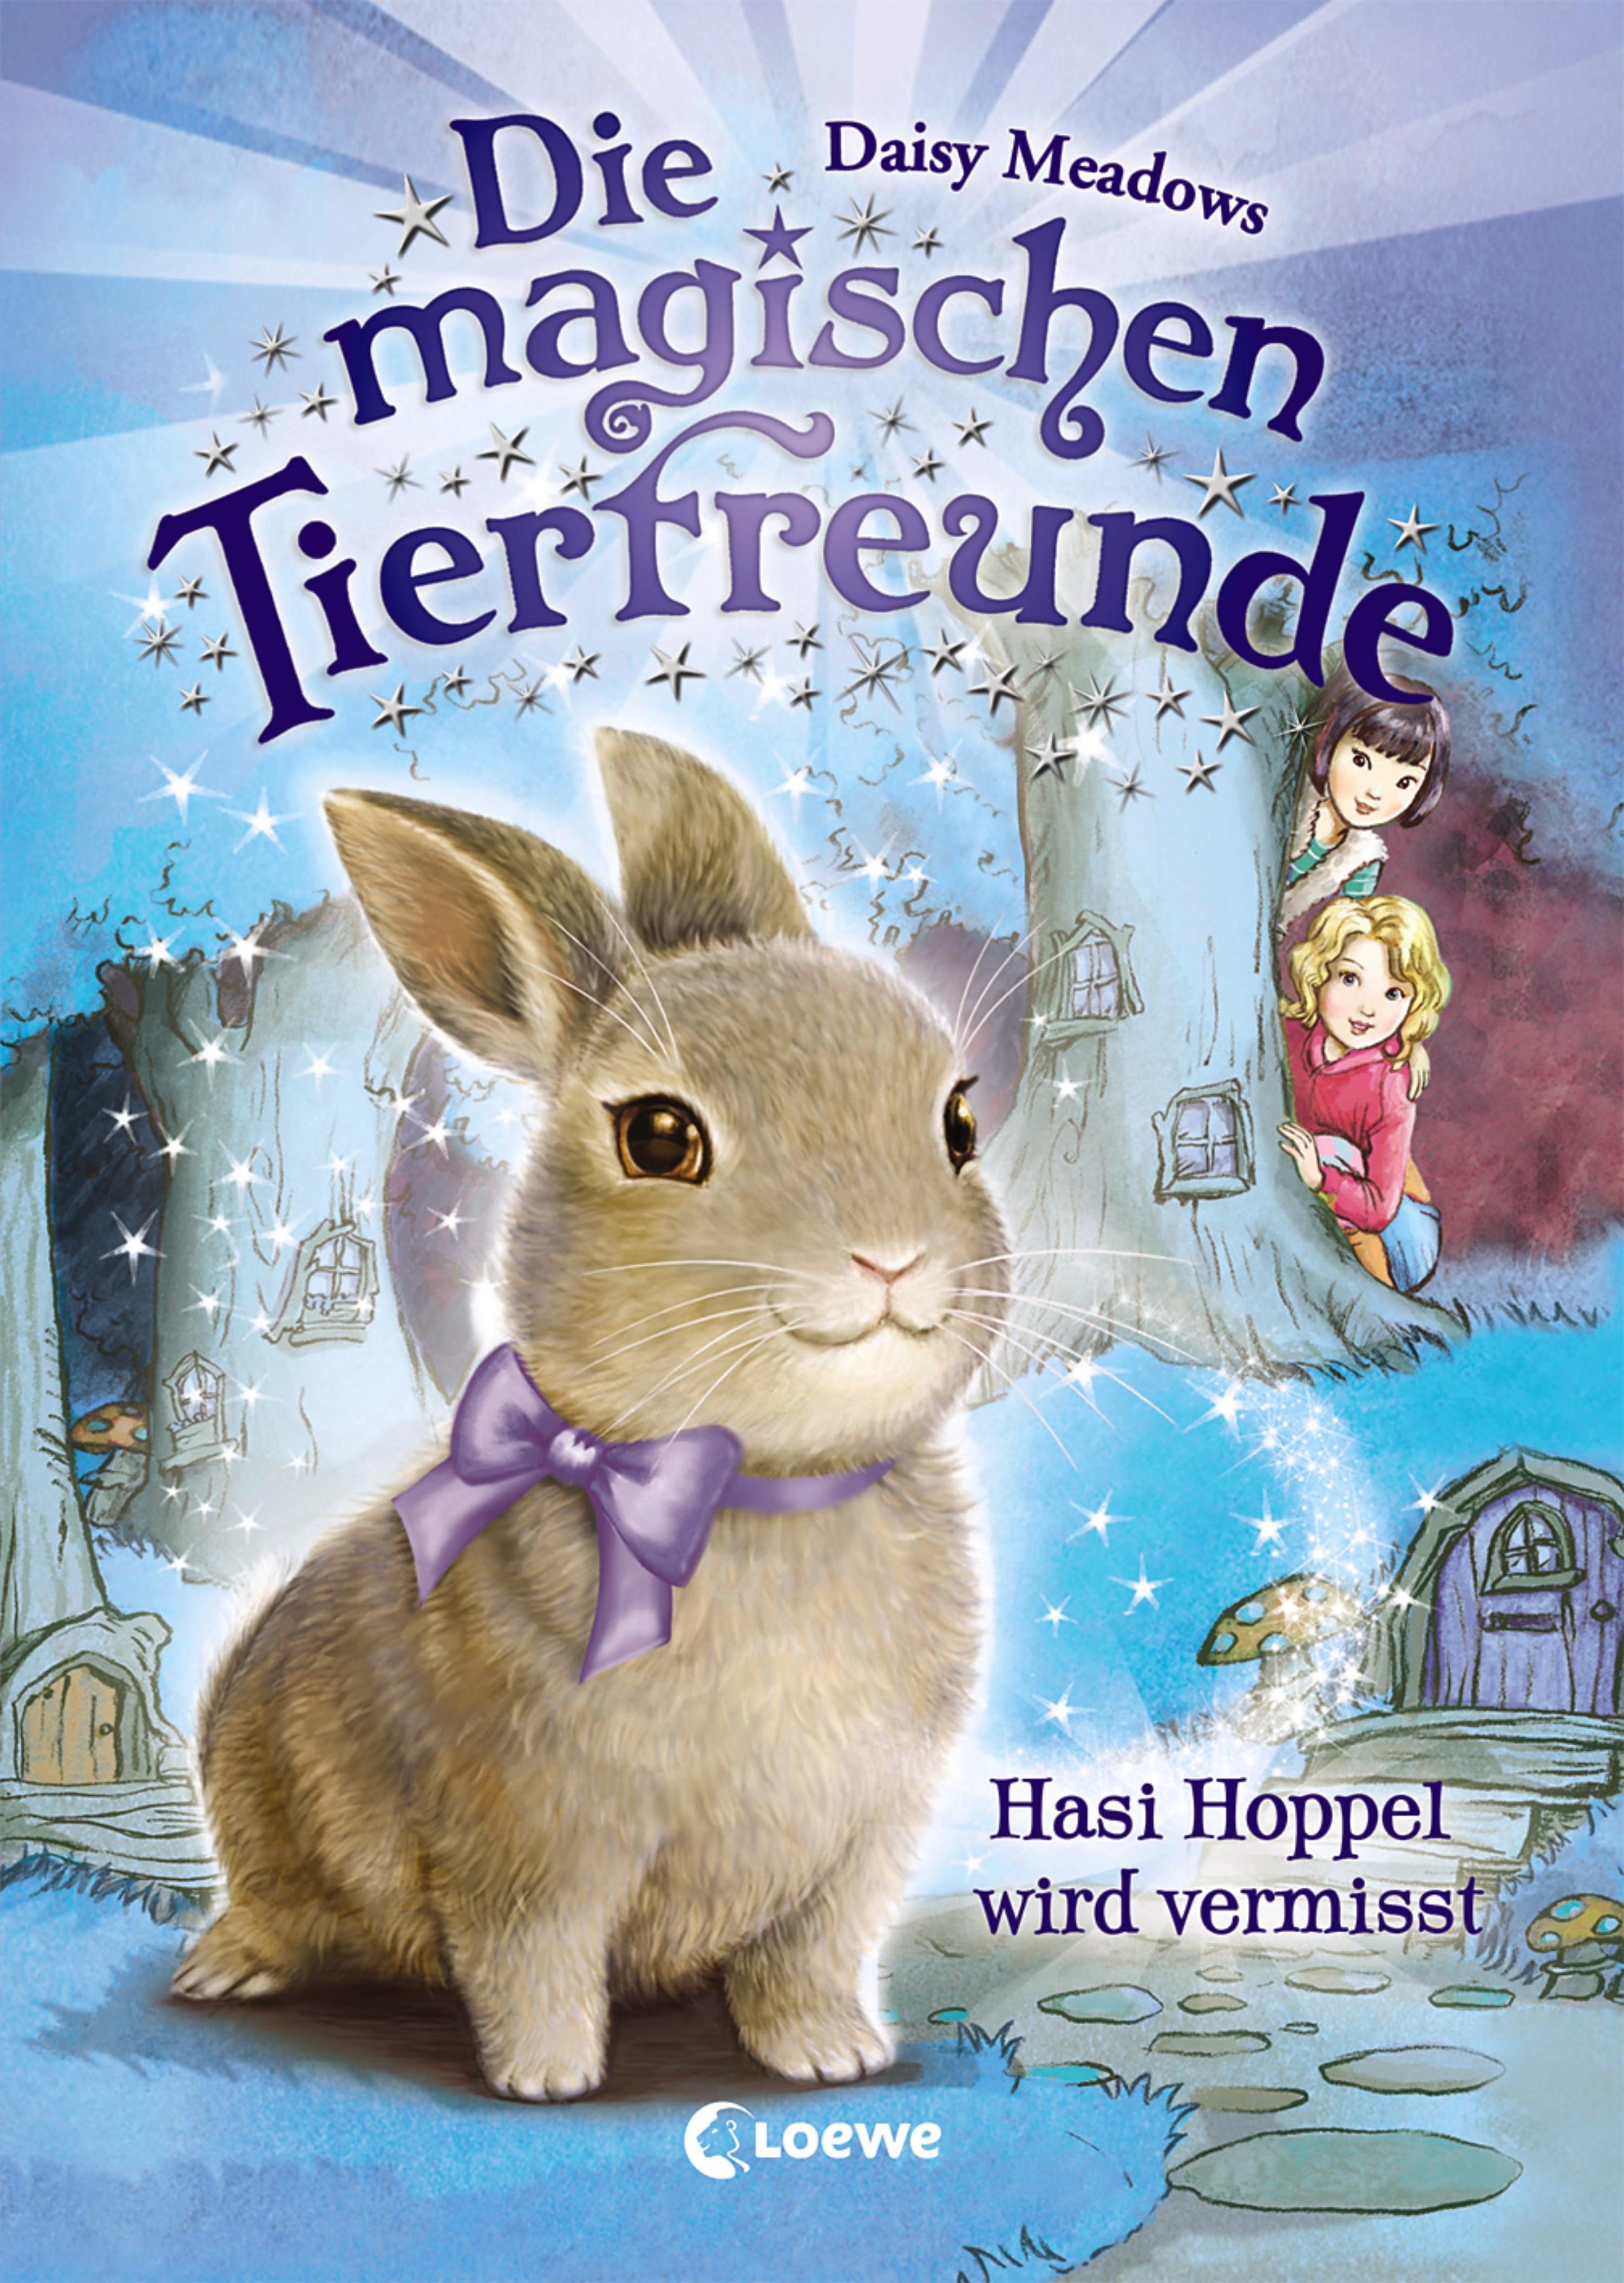 Daisy Meadows Die magischen Tierfreunde 1 - Hasi Hoppel wird vermisst daisy meadows magic animal friends early reader lucy longwhiskers